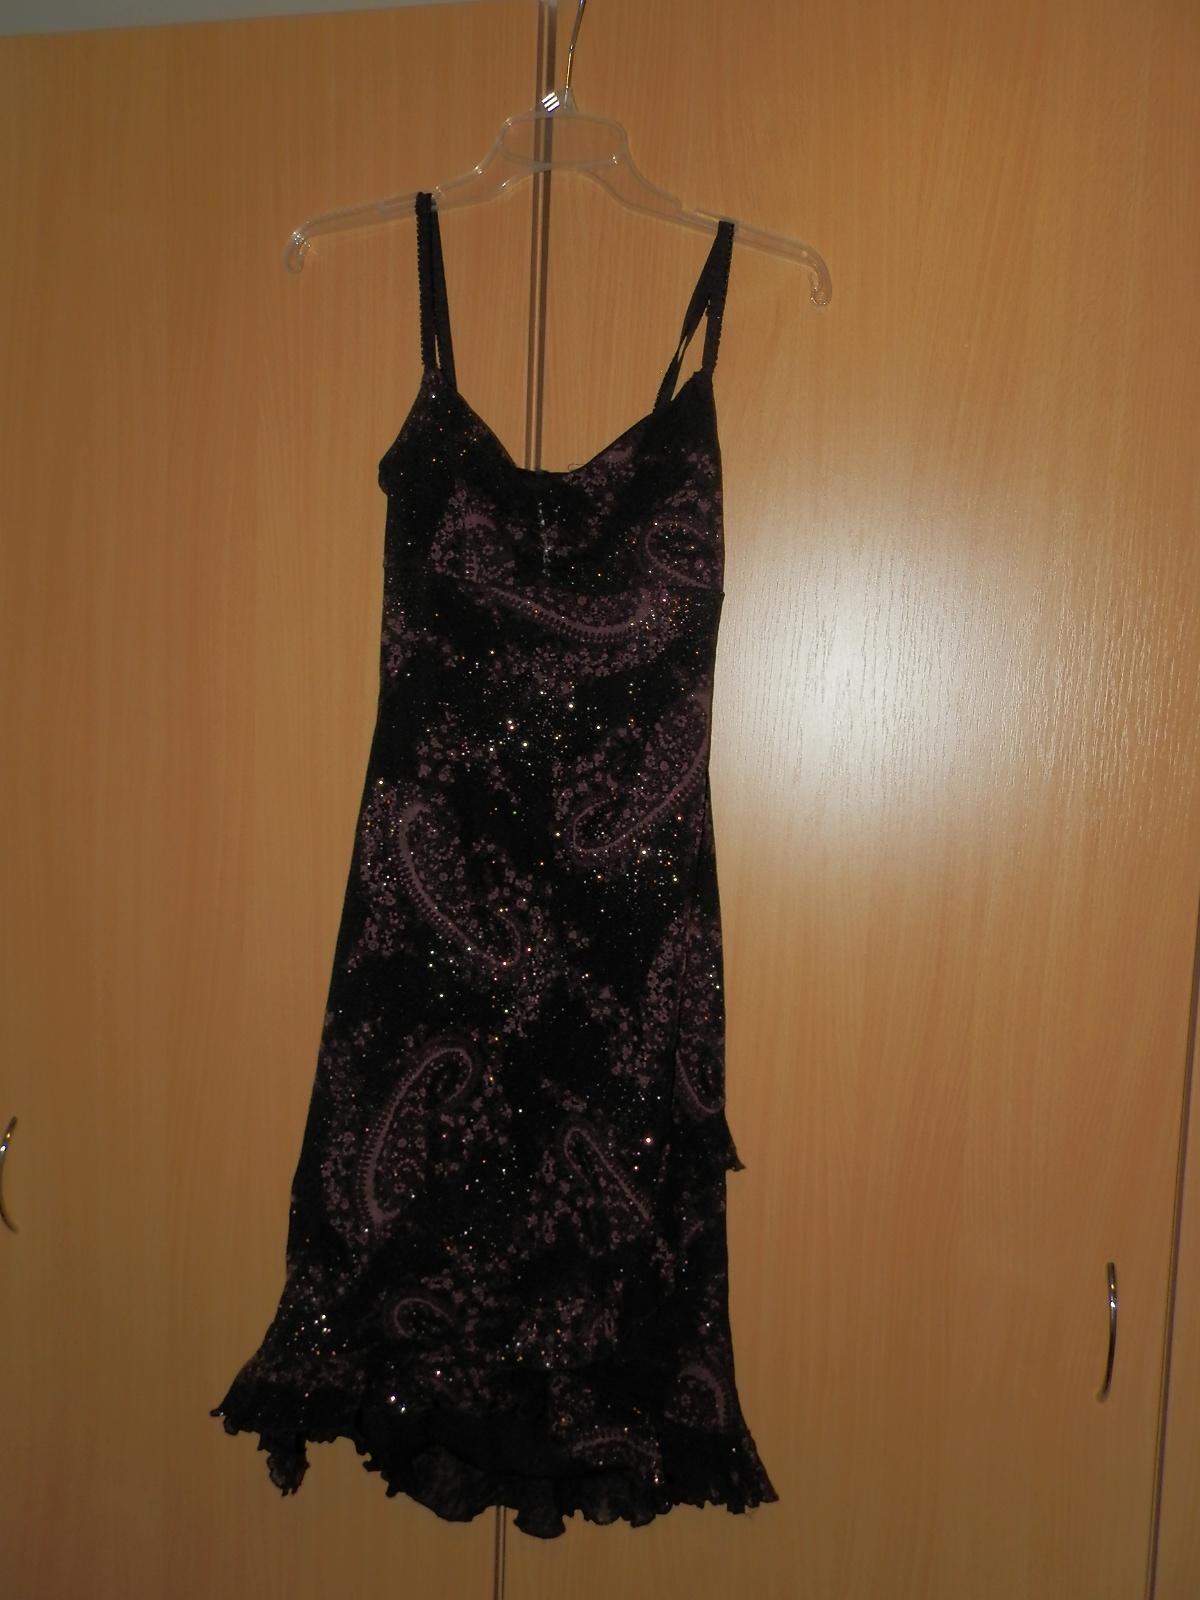 H&M fialkovočierne elegantné šaty S/M - Obrázok č. 1